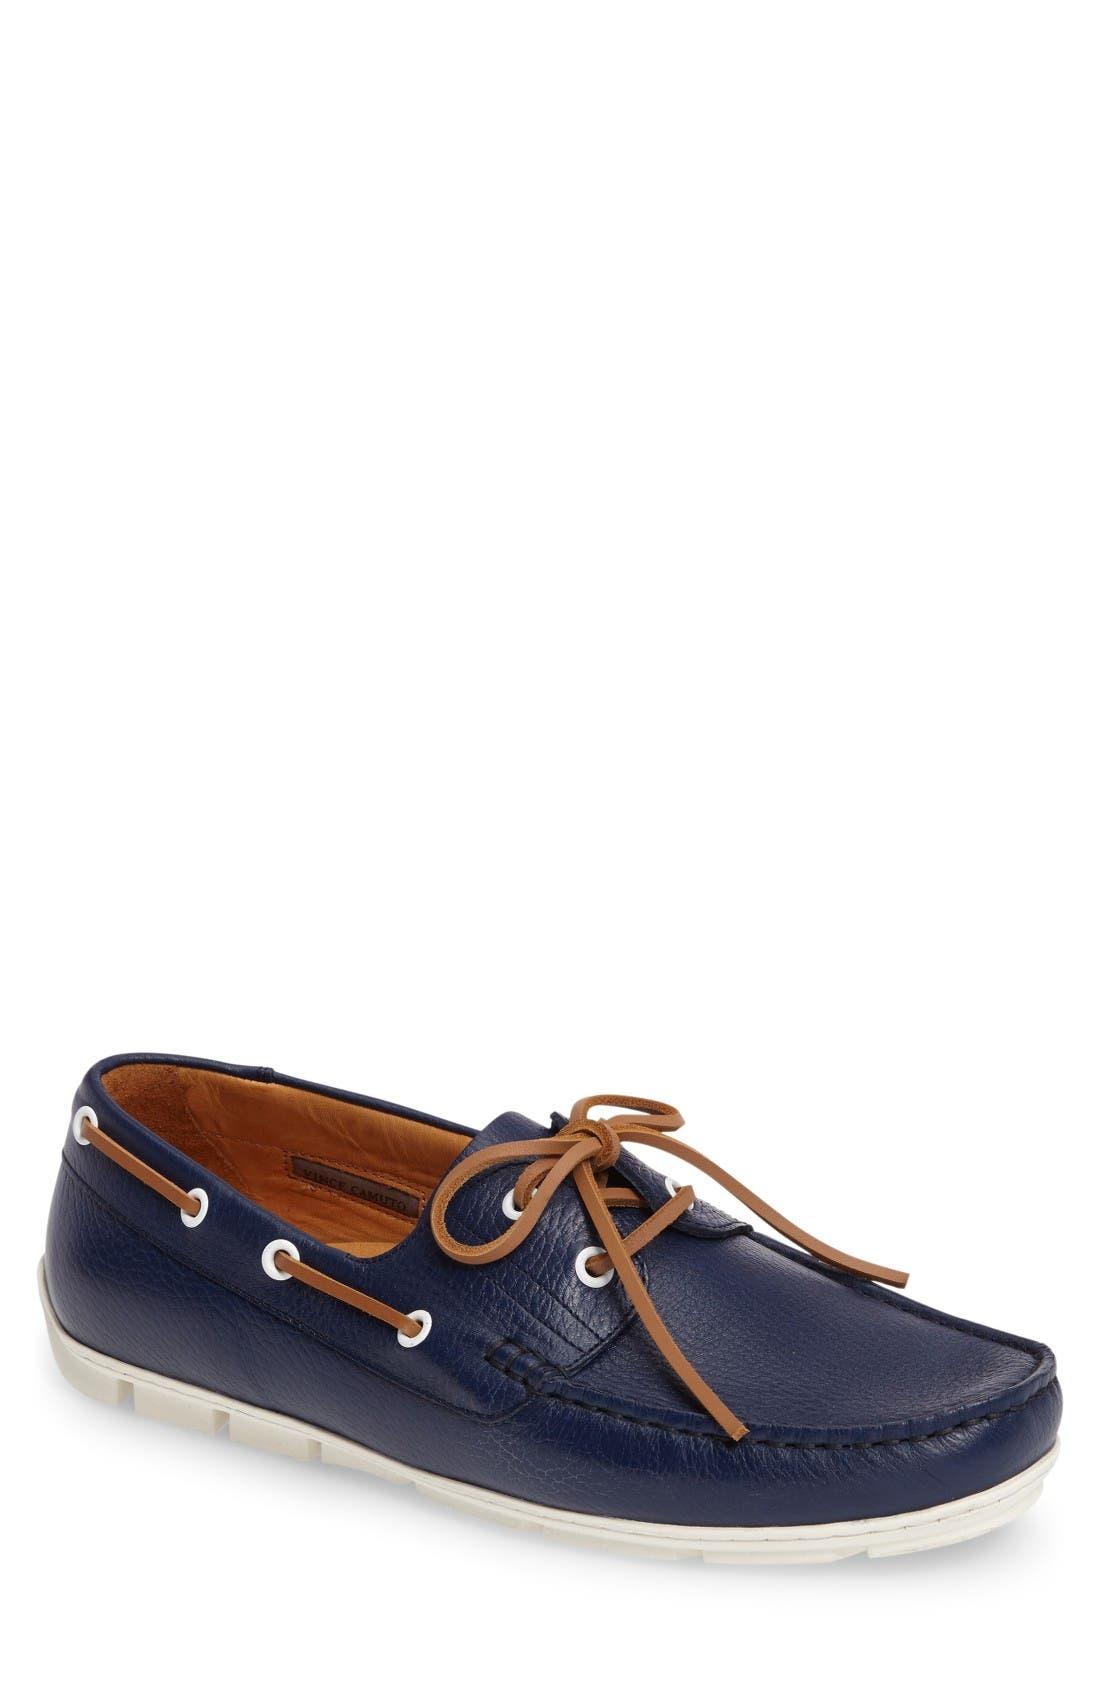 Alternate Image 1 Selected - Vince Camuto Don Boat Shoe (Men)